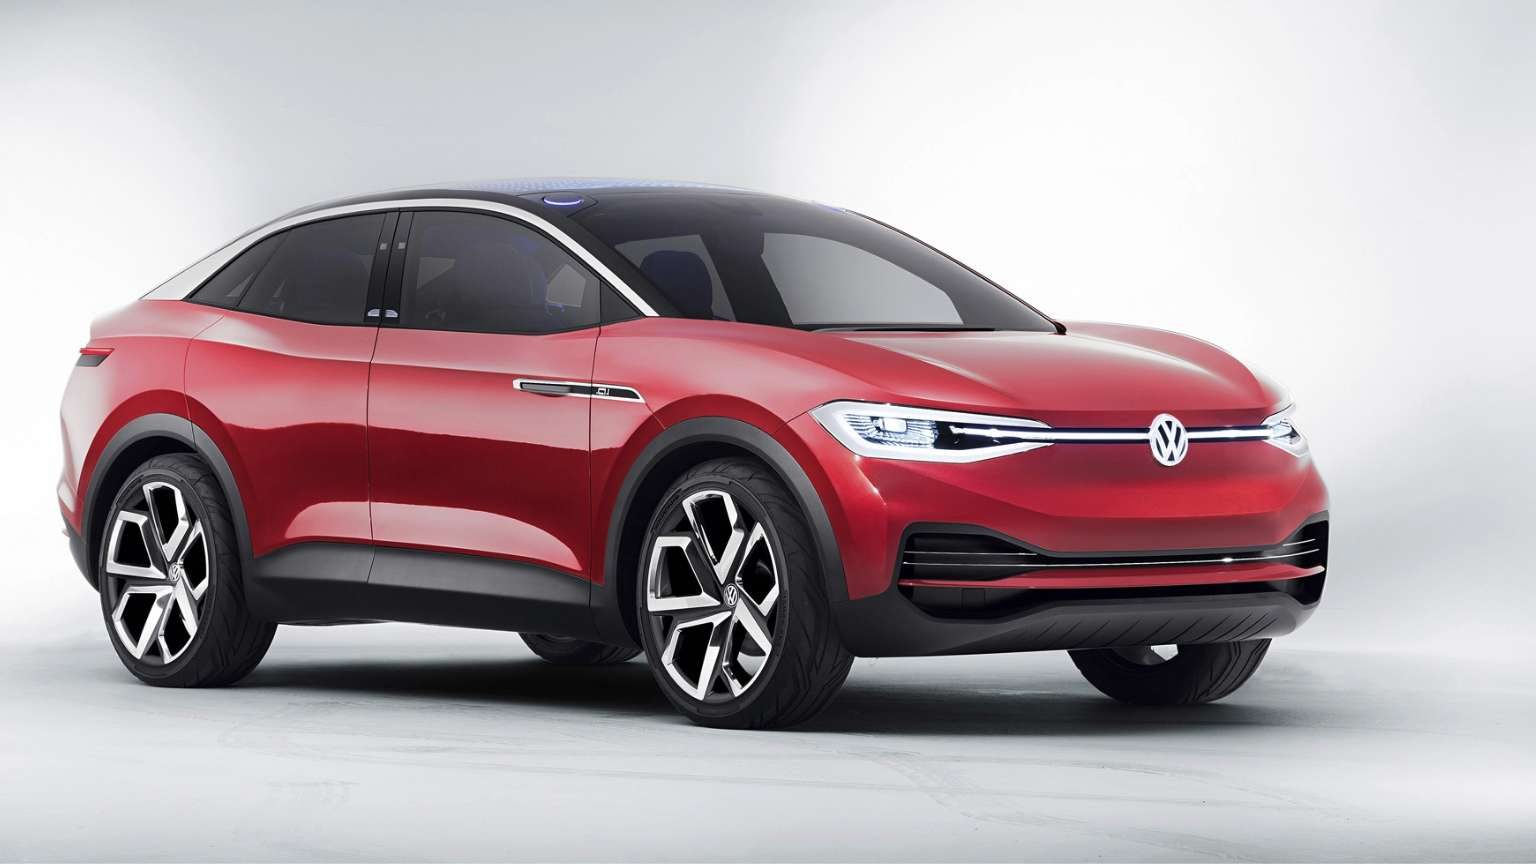 Volkswagen ID Crozz crossover SUV